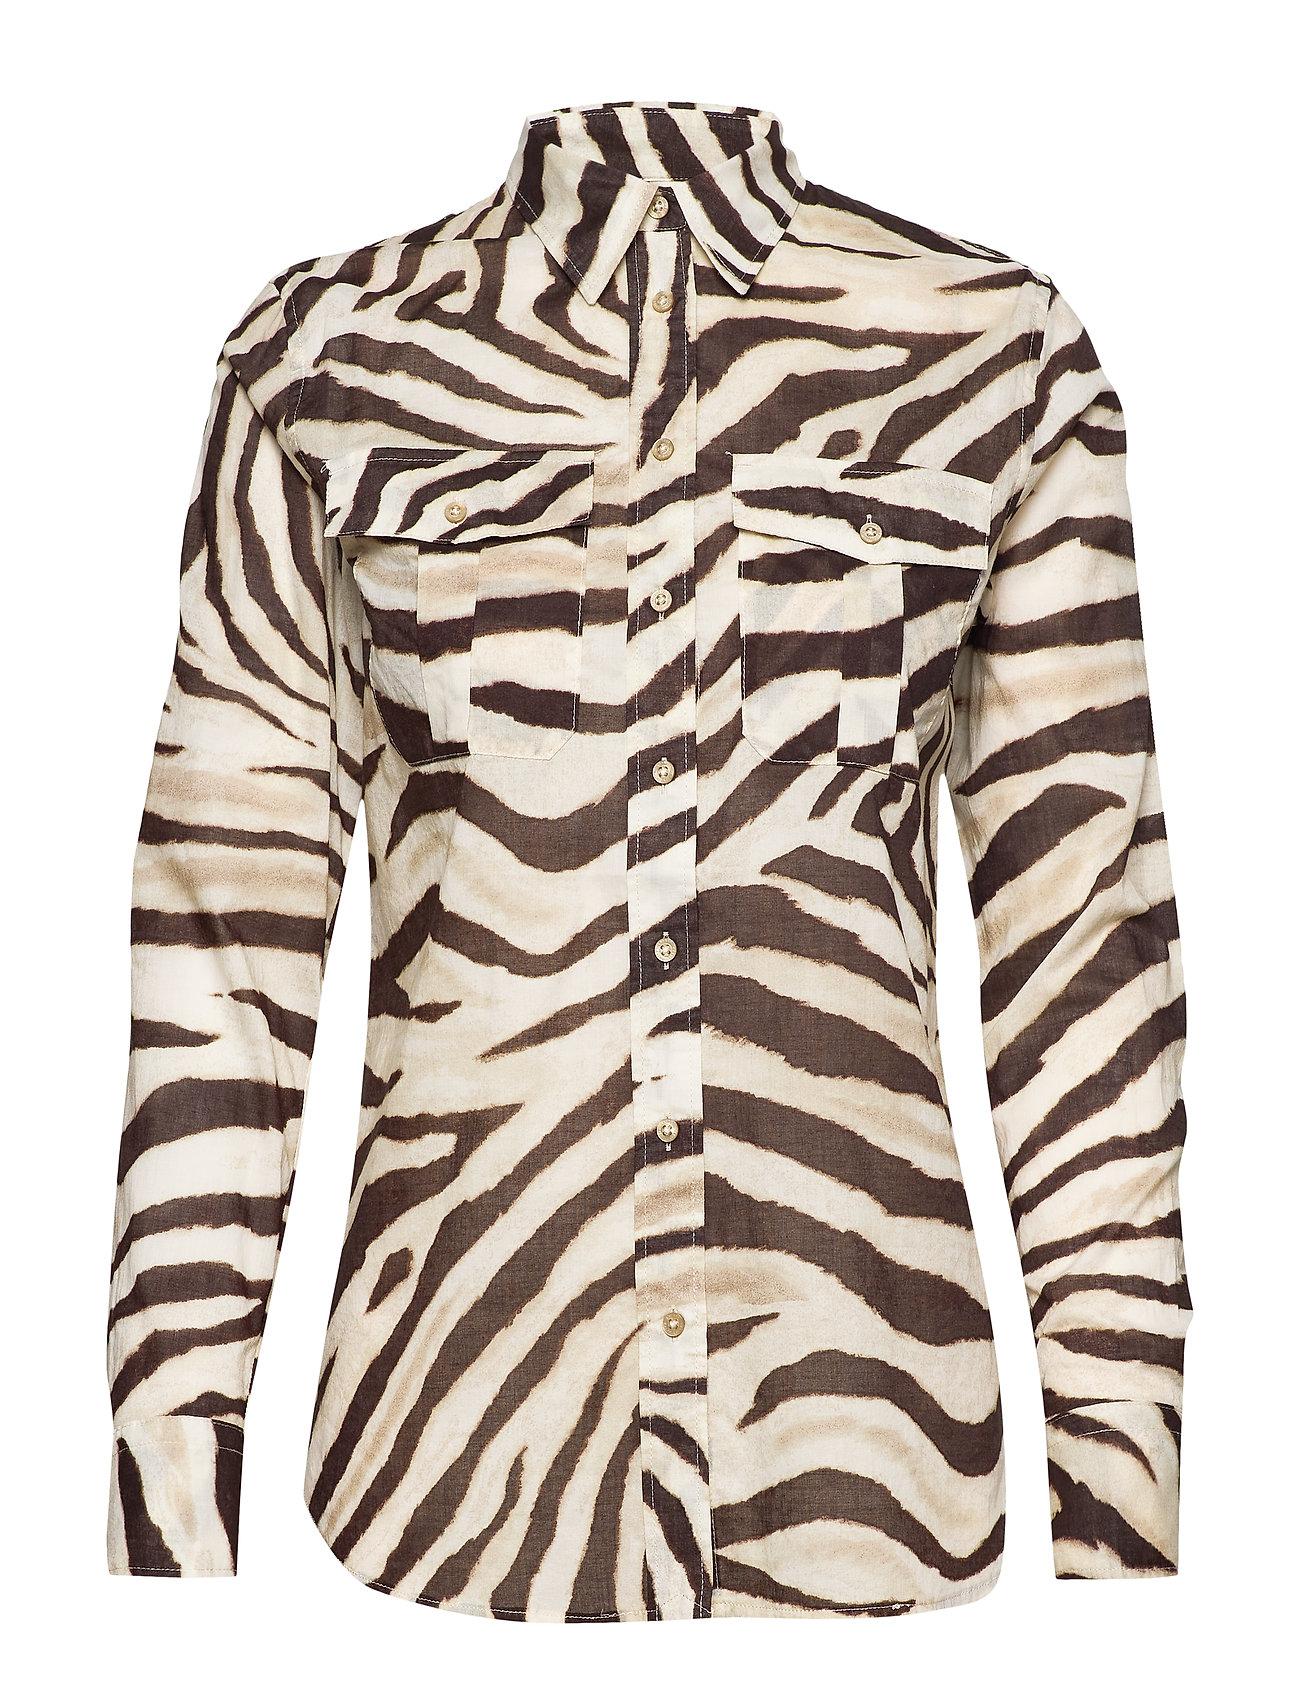 Lauren Ralph Lauren Print Cotton Shirt - DK BROWN MULTI